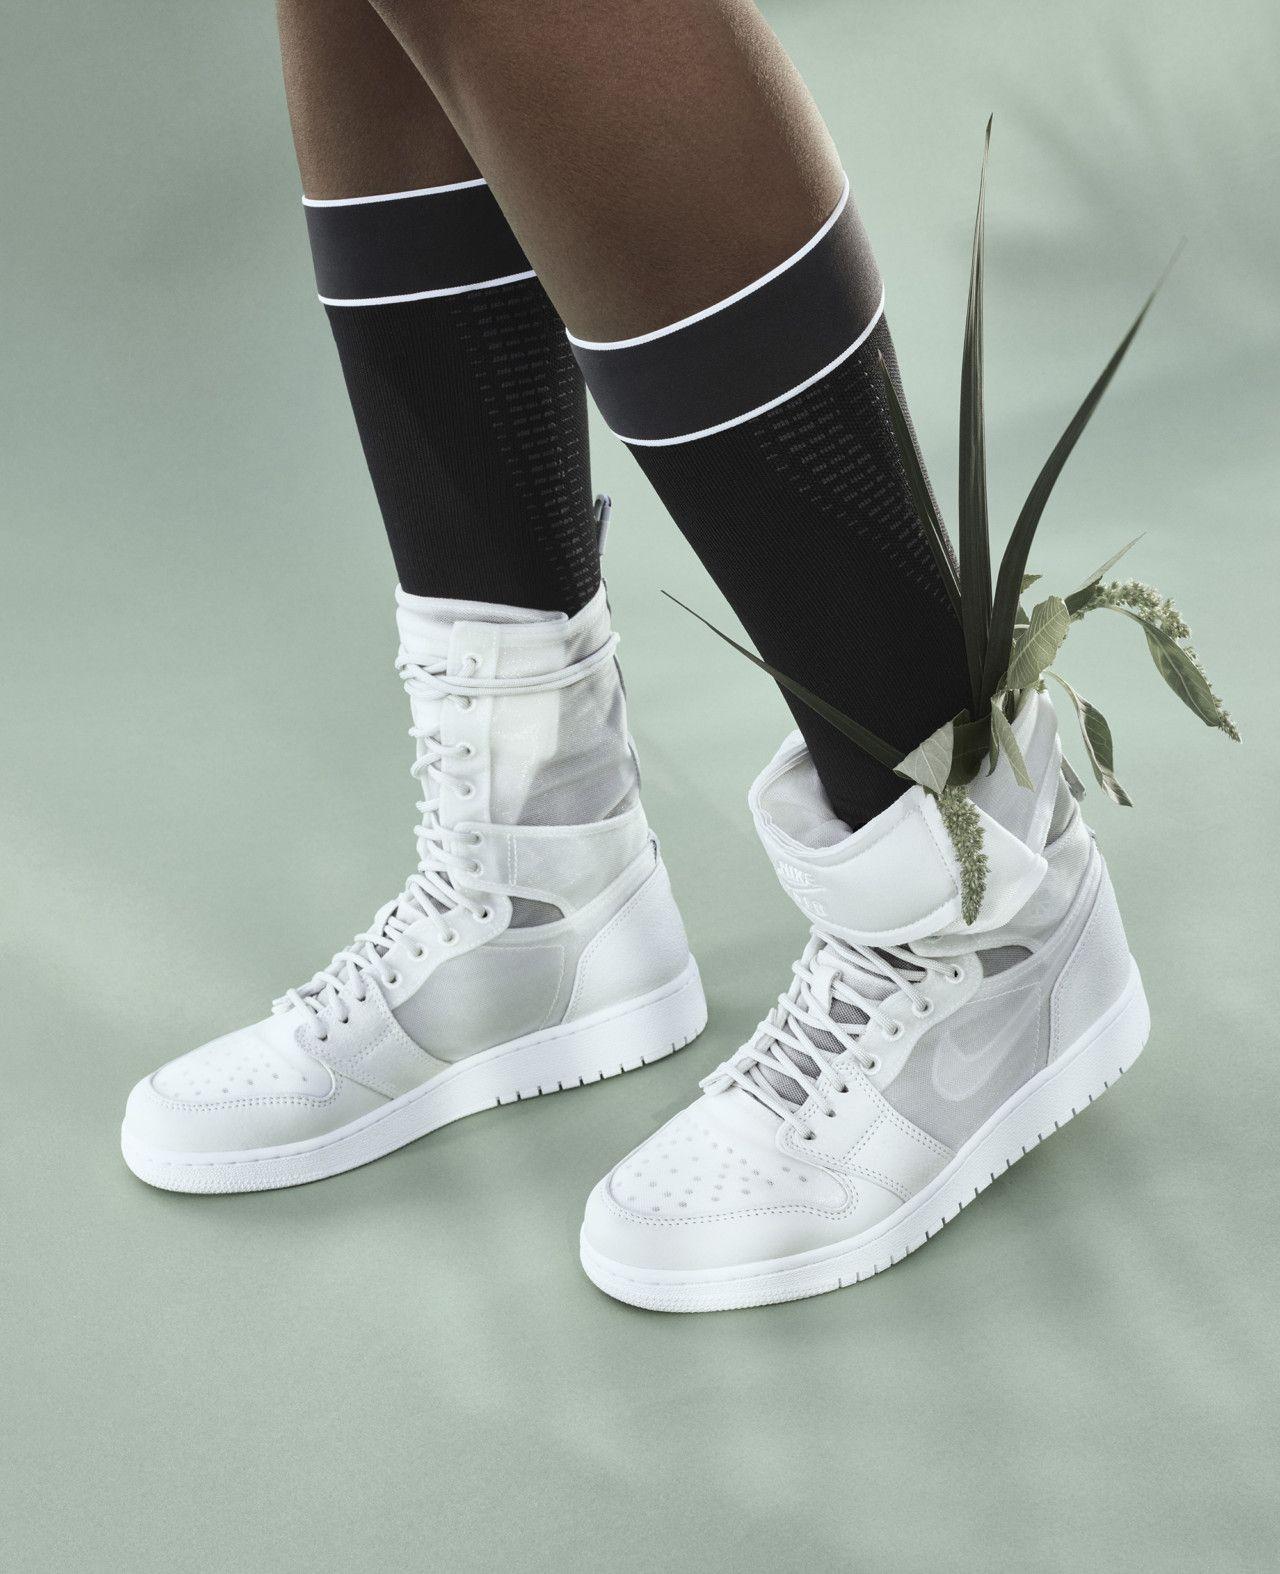 5ab09f3aef5f11 The 1 Reimagined  14 Women Remix Iconic Nike Silhouettes - Design Milk